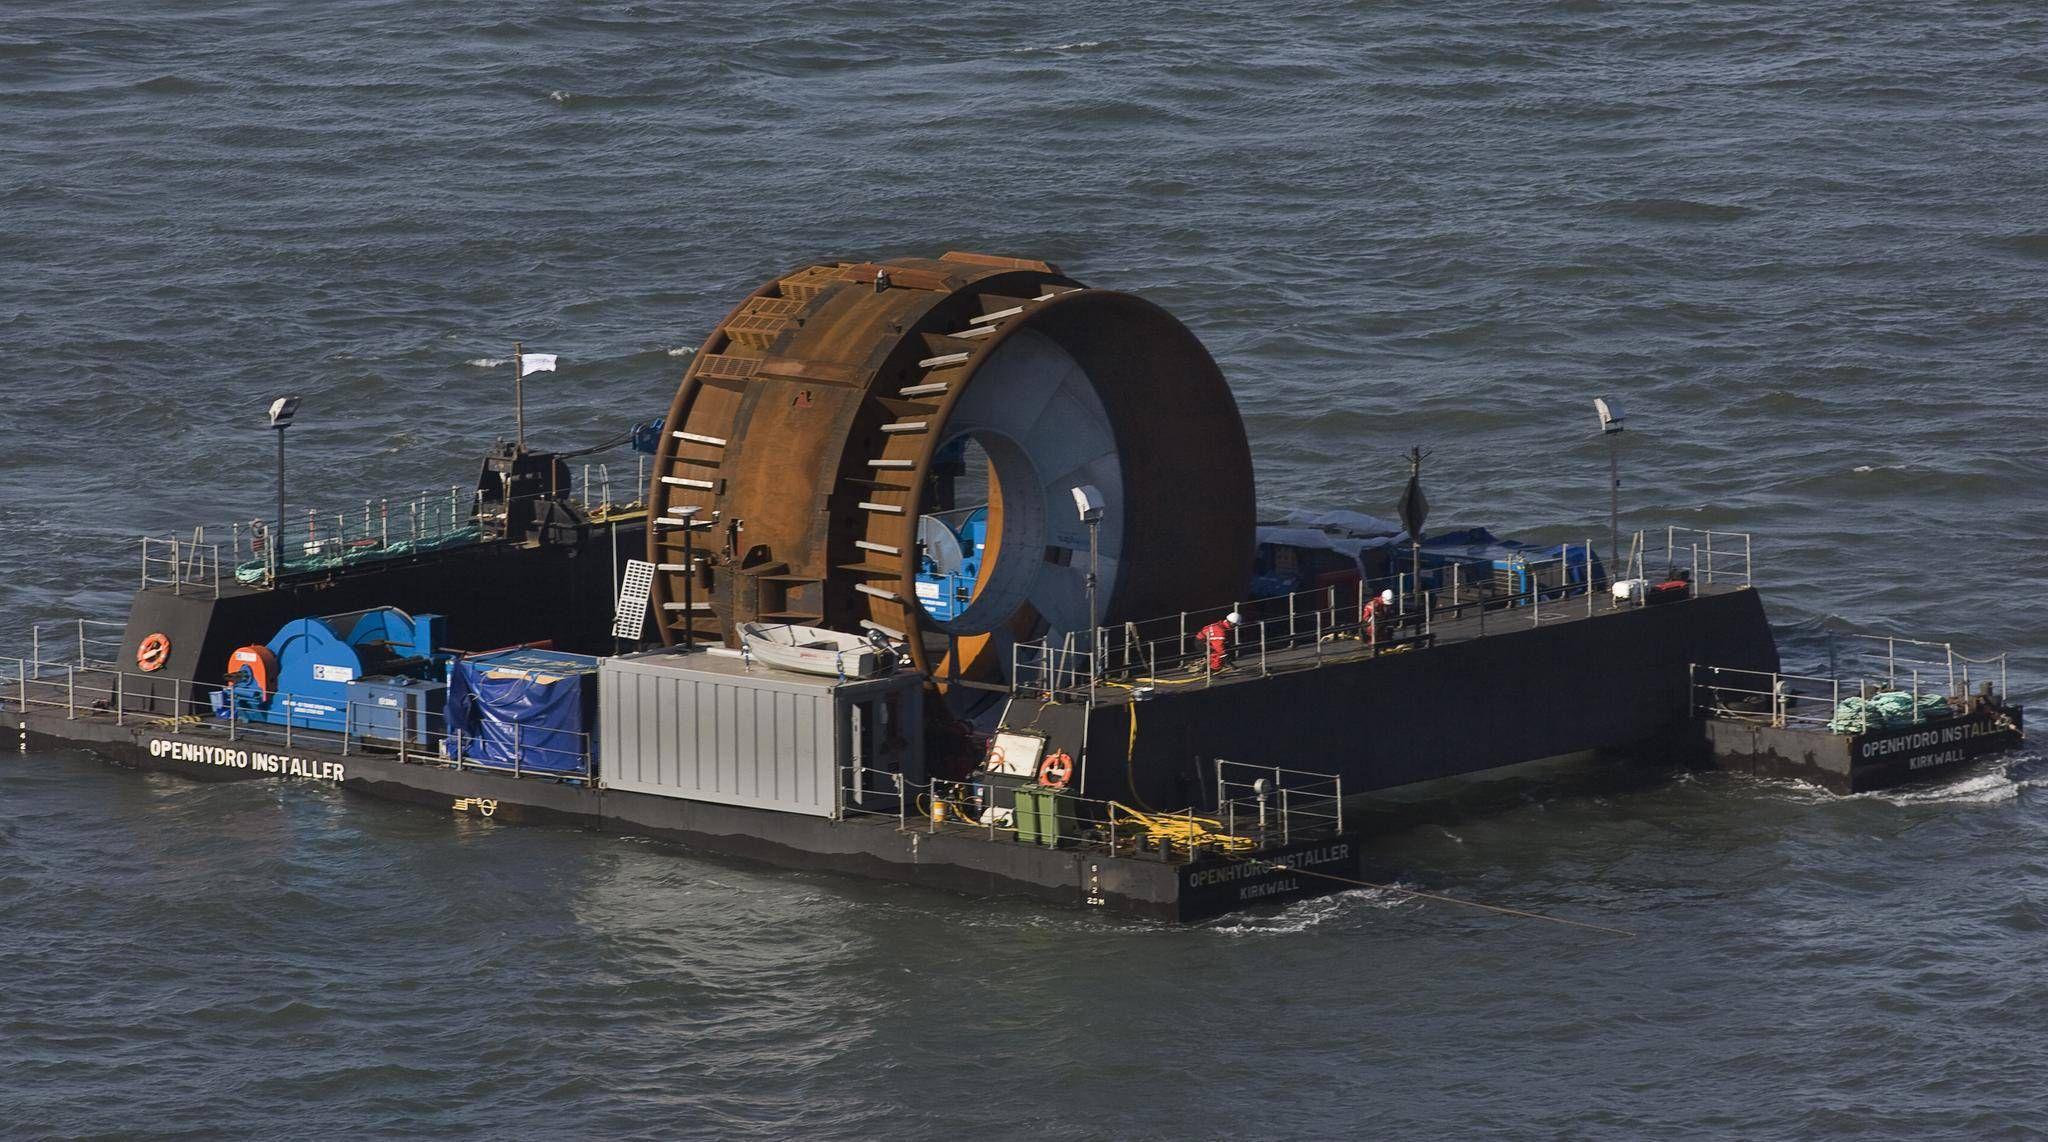 Nova Scotia and British Columbia partner on tidal energy development